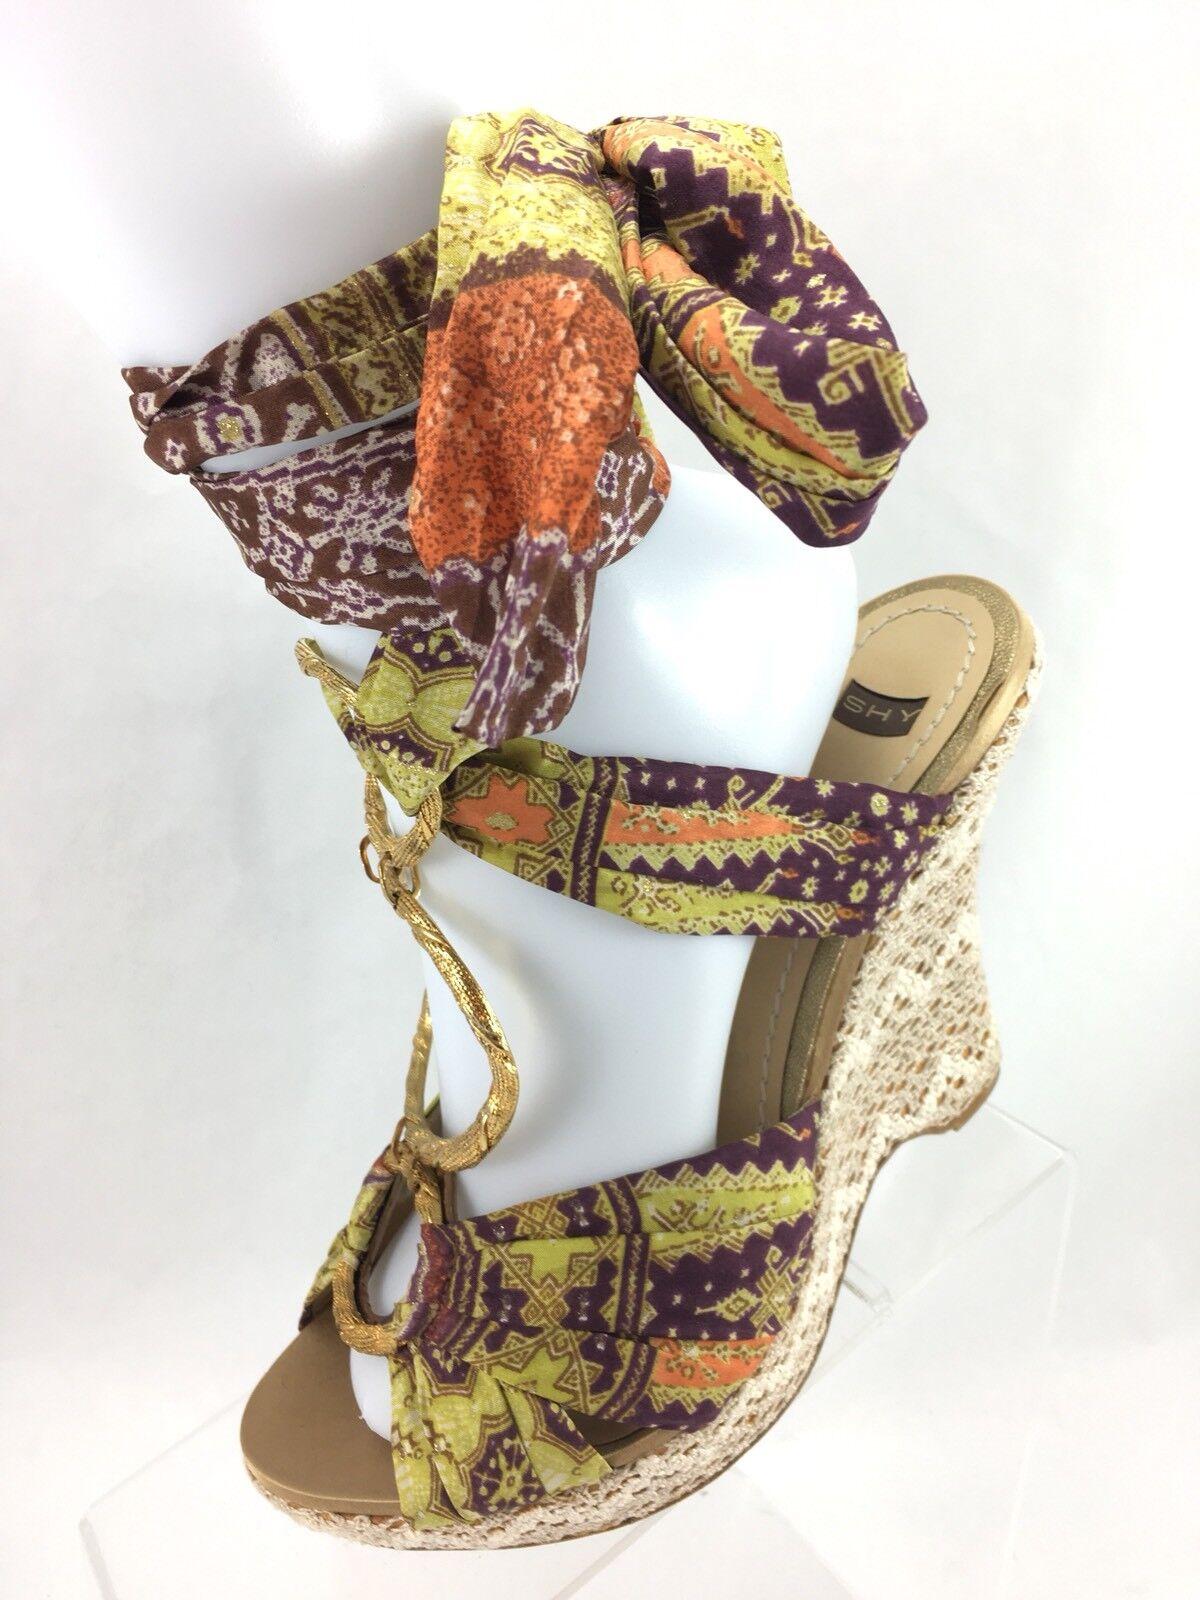 offerta speciale SH3 Shy US 8.5 EUR EUR EUR 39  Made Platform Wedge Heel scarpe Lace Embellished Tie  prezzi bassi di tutti i giorni